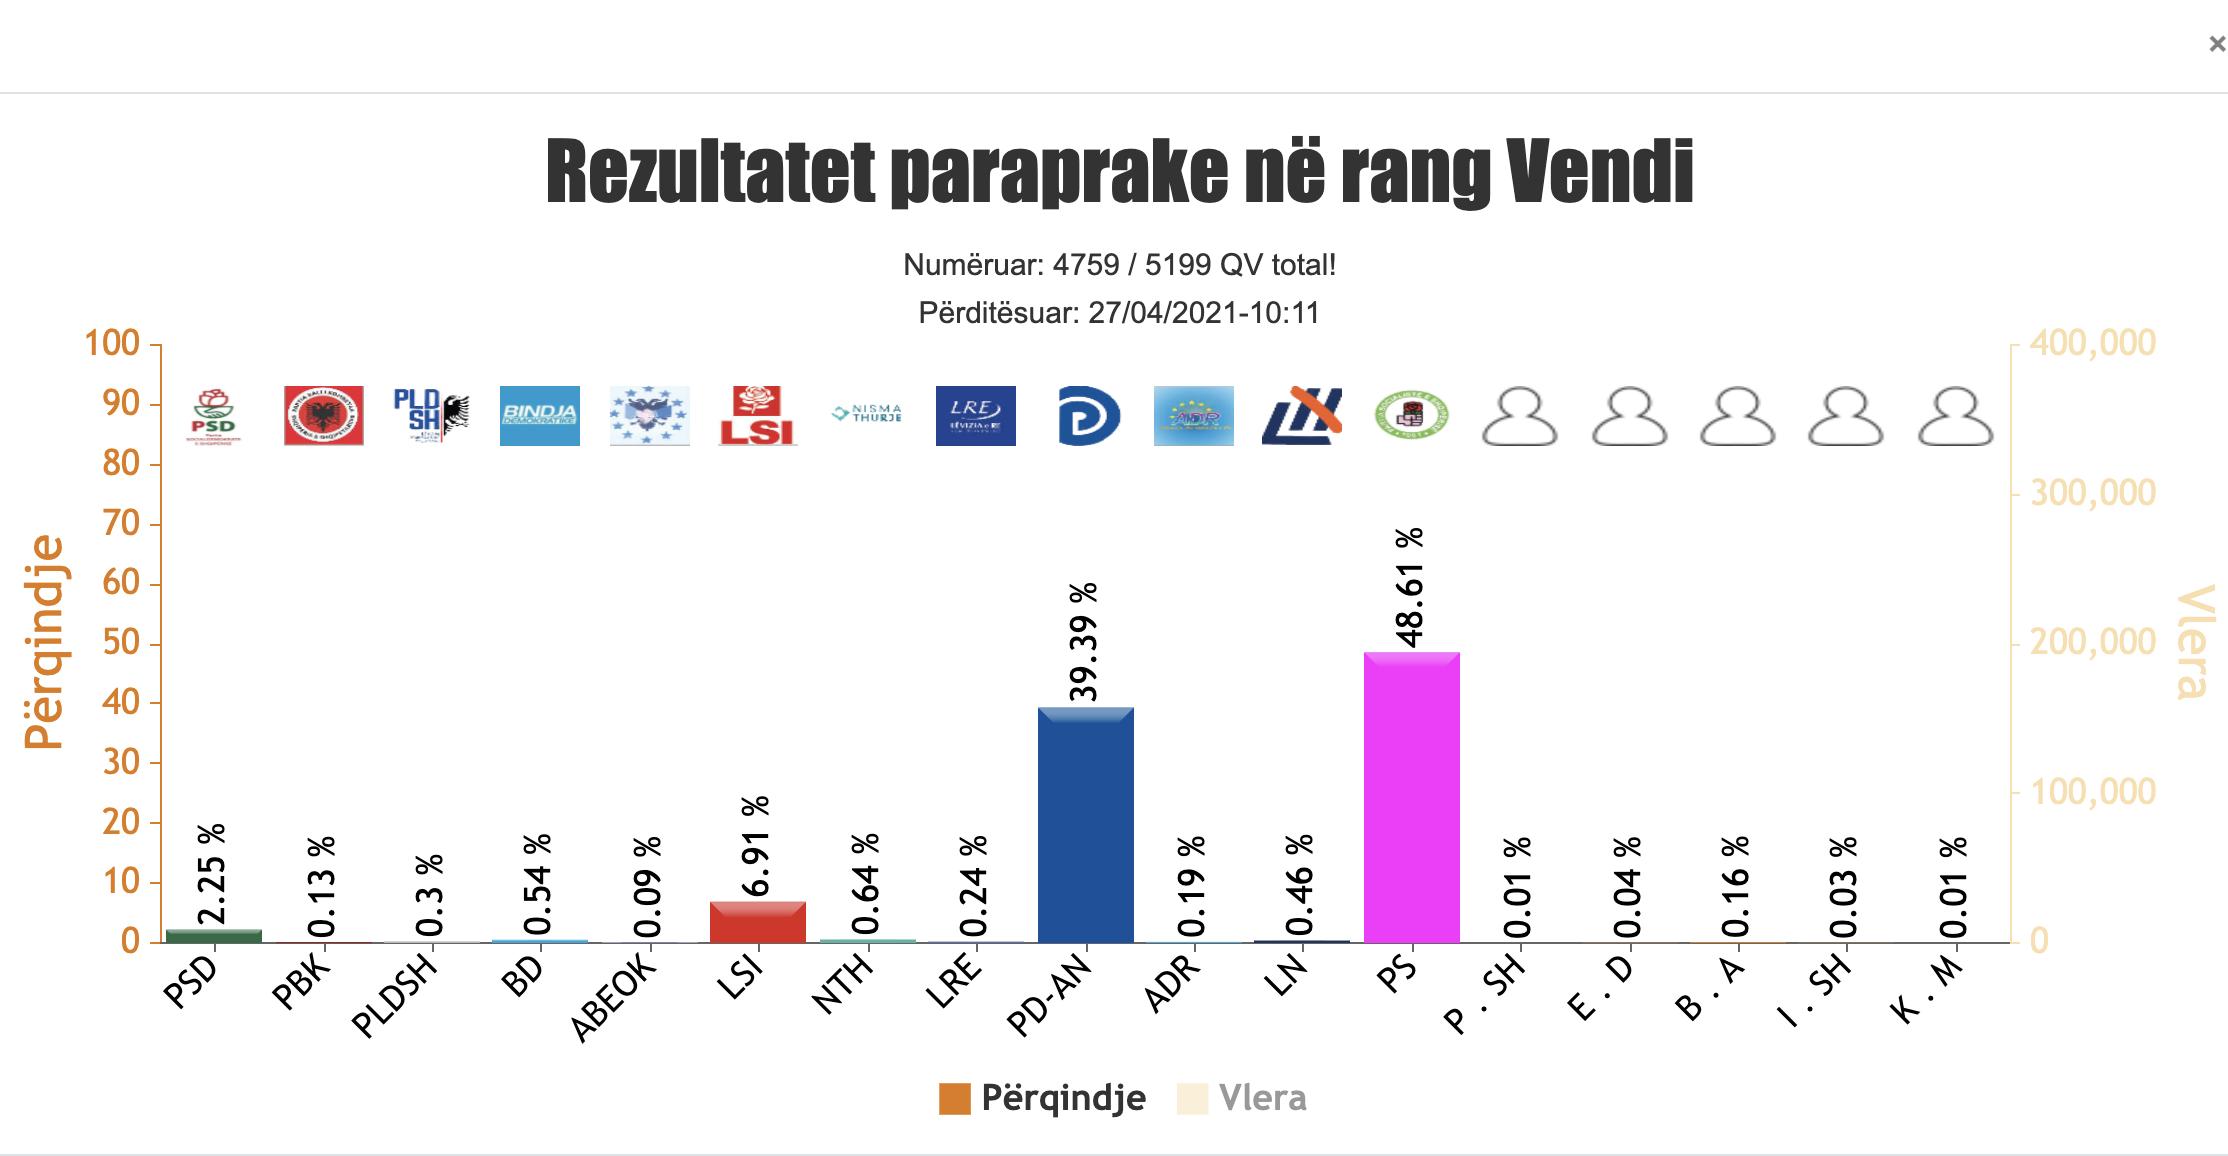 Albanija: PS 48,61%, PD 39,39%, LSI 6,91% and PSD 2,25%